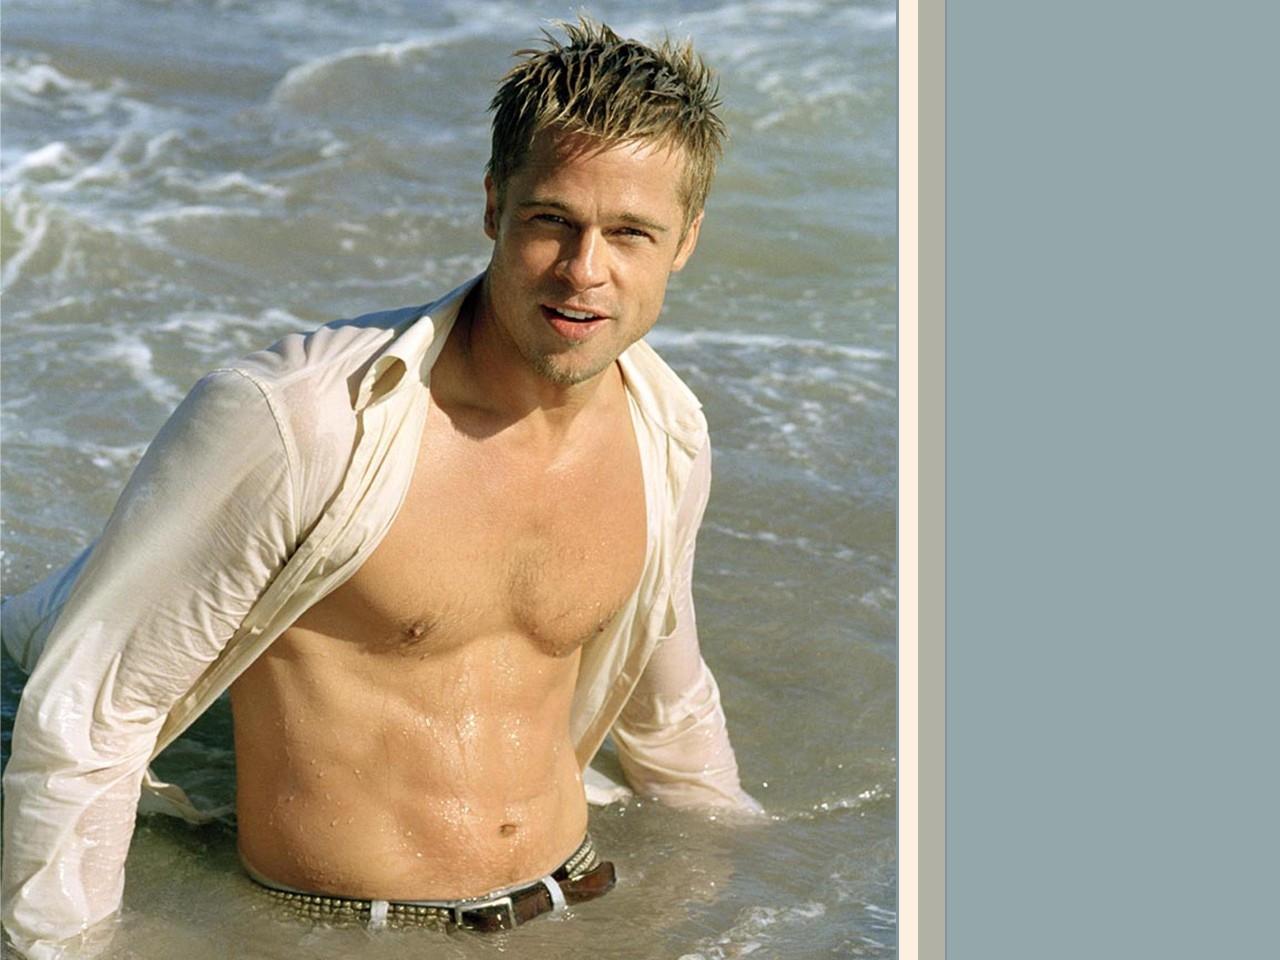 Wallpaper di Brad Pitt a torso nudo